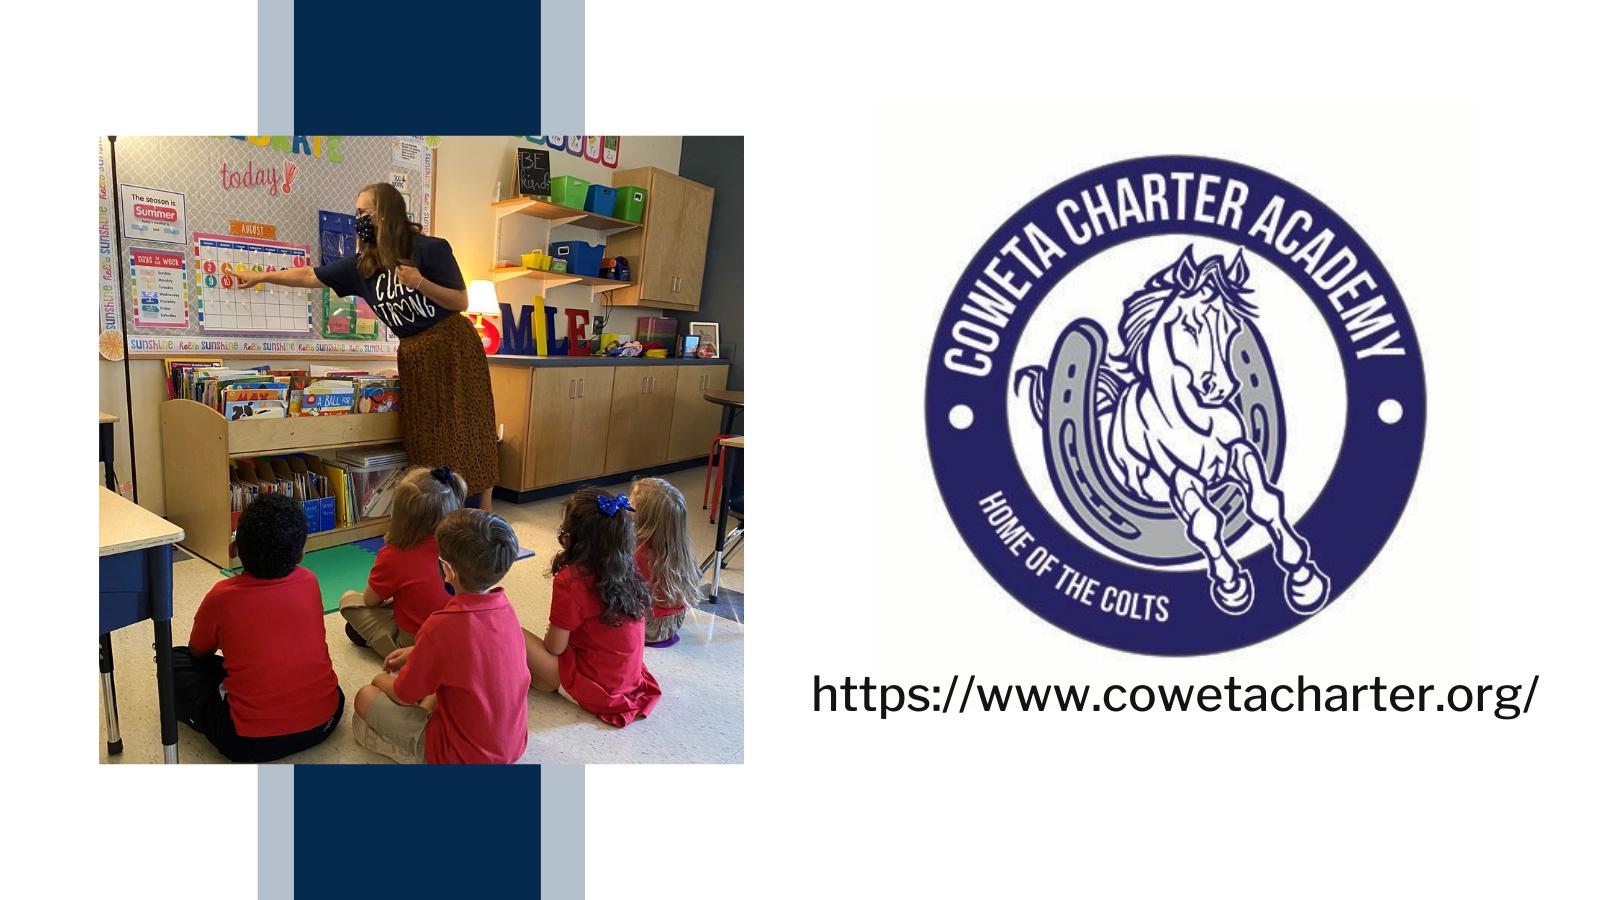 Coweta Charter